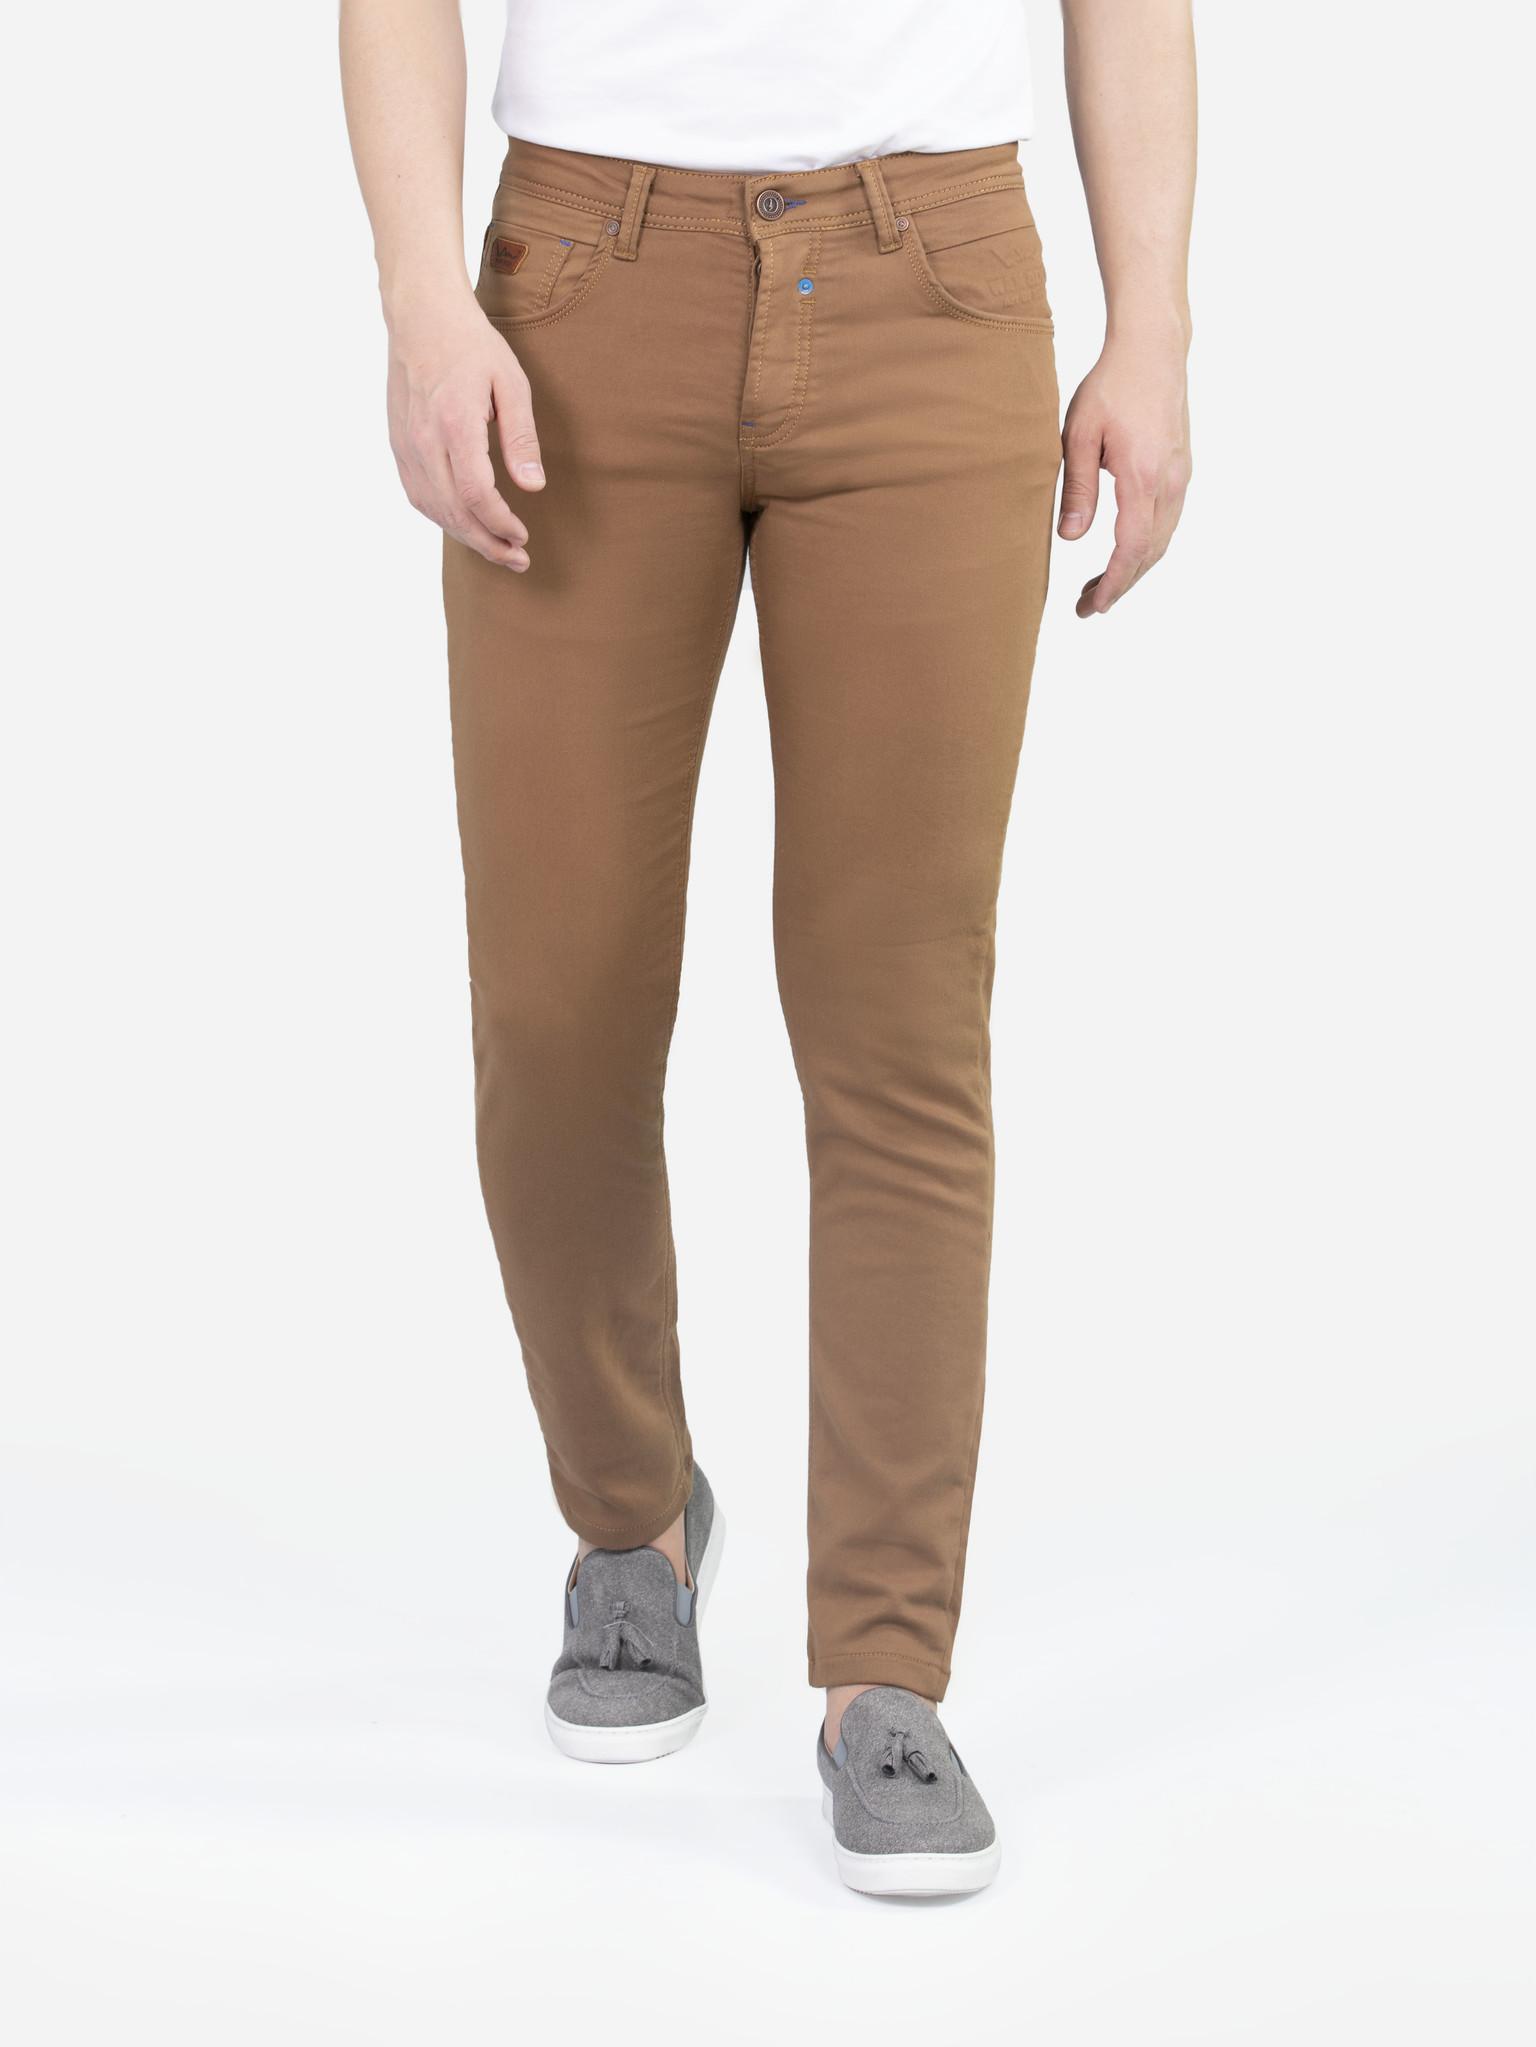 Wam Denim Jeans  Maat: 42/34